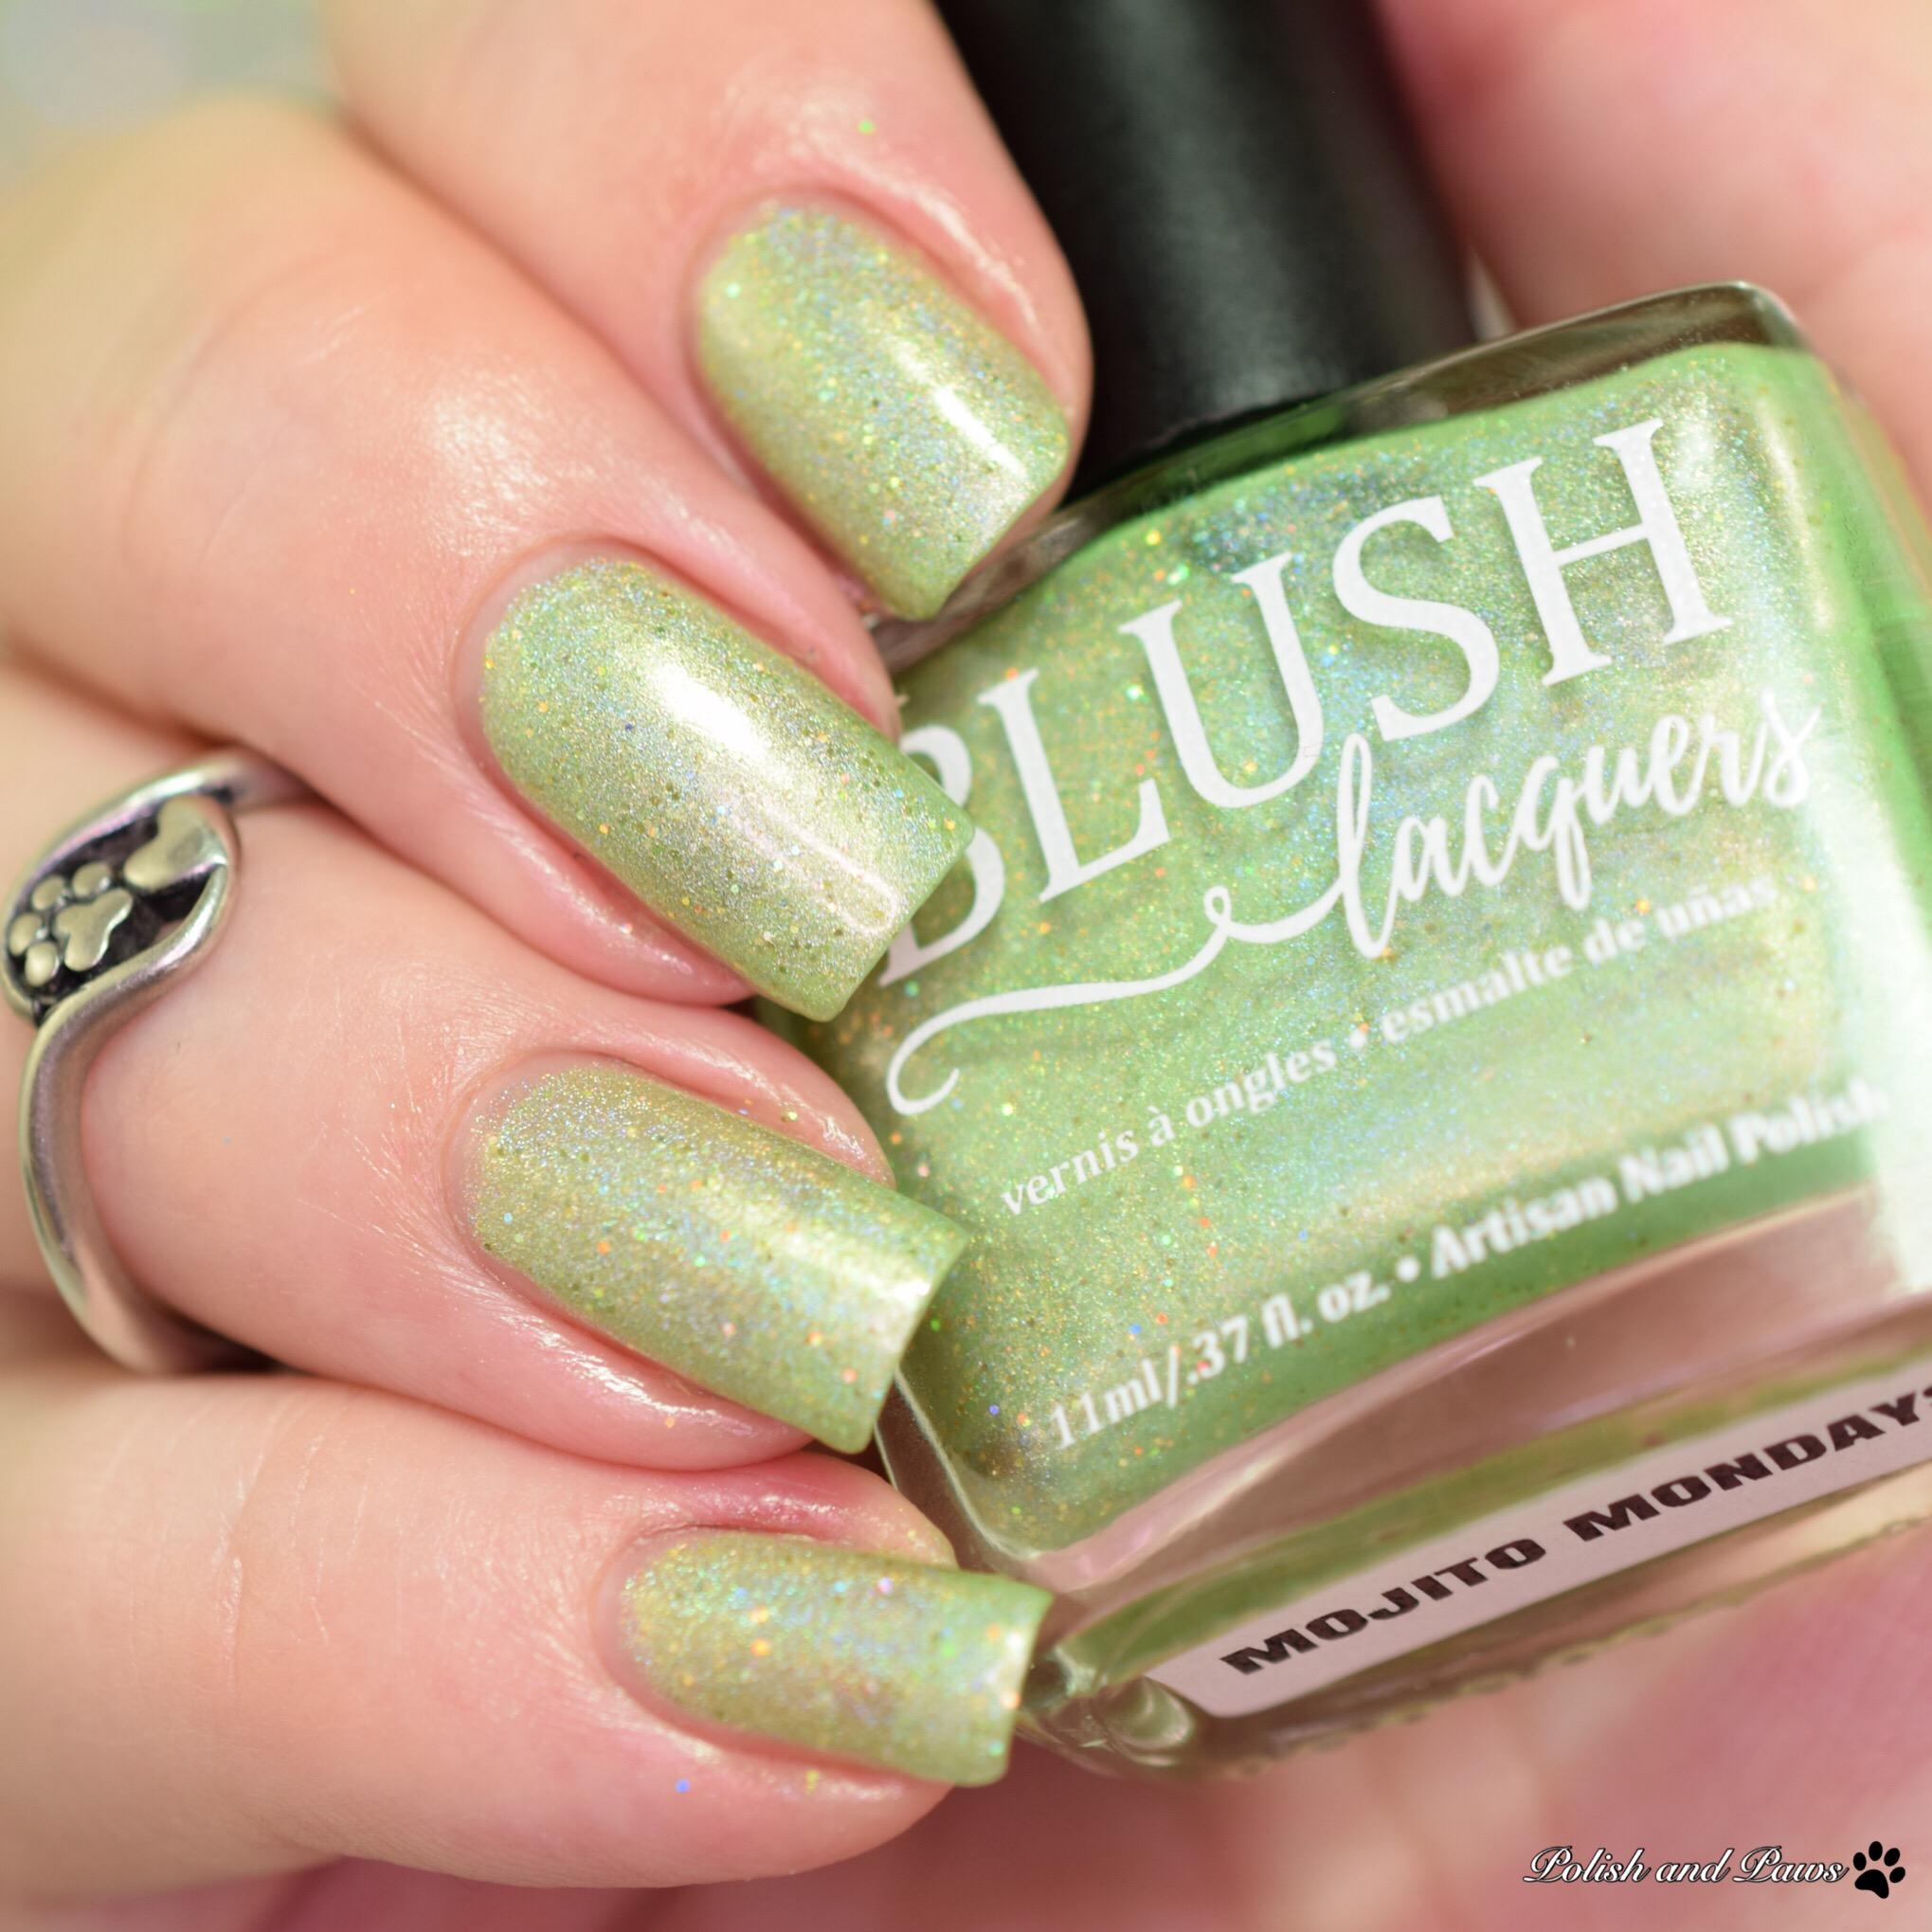 Blush Lacquers Mojito Mondays